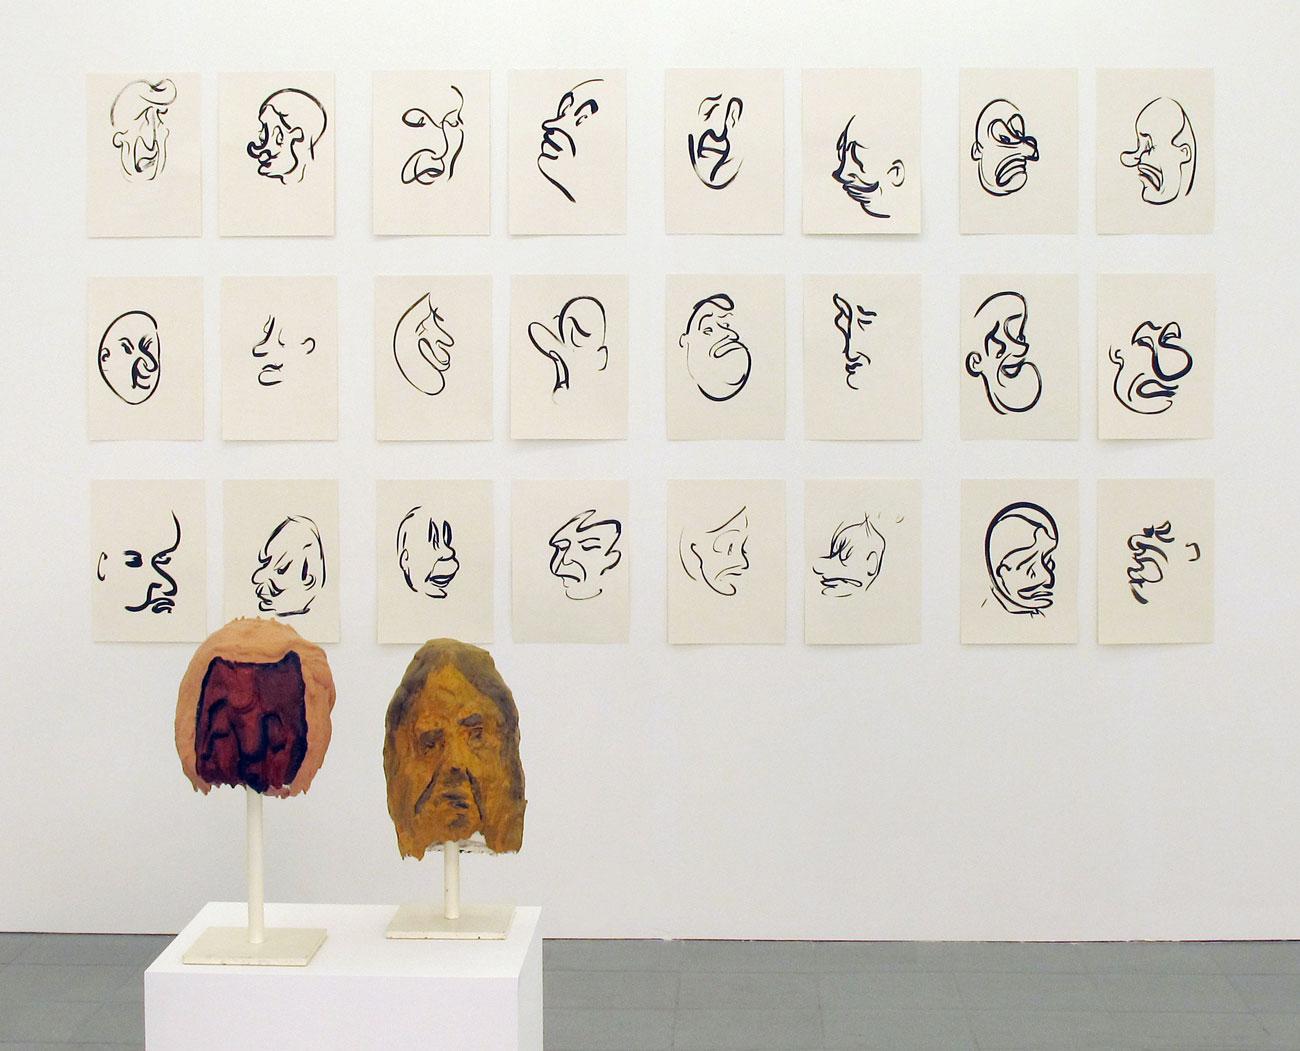 sam-porritt-Untitled-(Heads)-Untitled-(Faces)